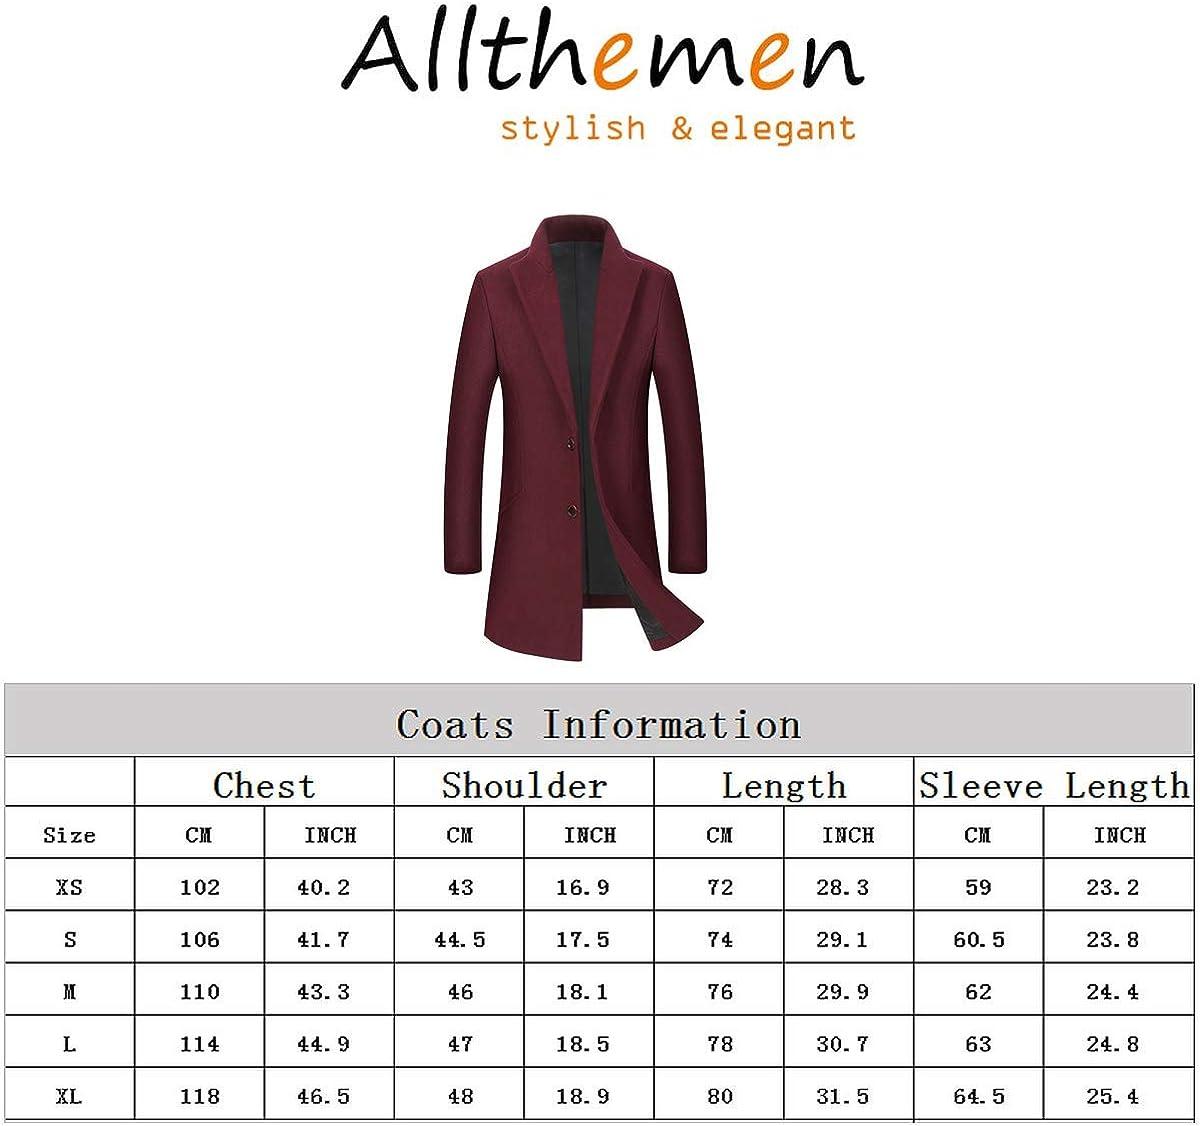 Allthemen Mens Trench Coat Long Slim Fit Wool Cashmere Coat Jacket Outerwear Trenchcoats Winter Warm Overcoat 1998black